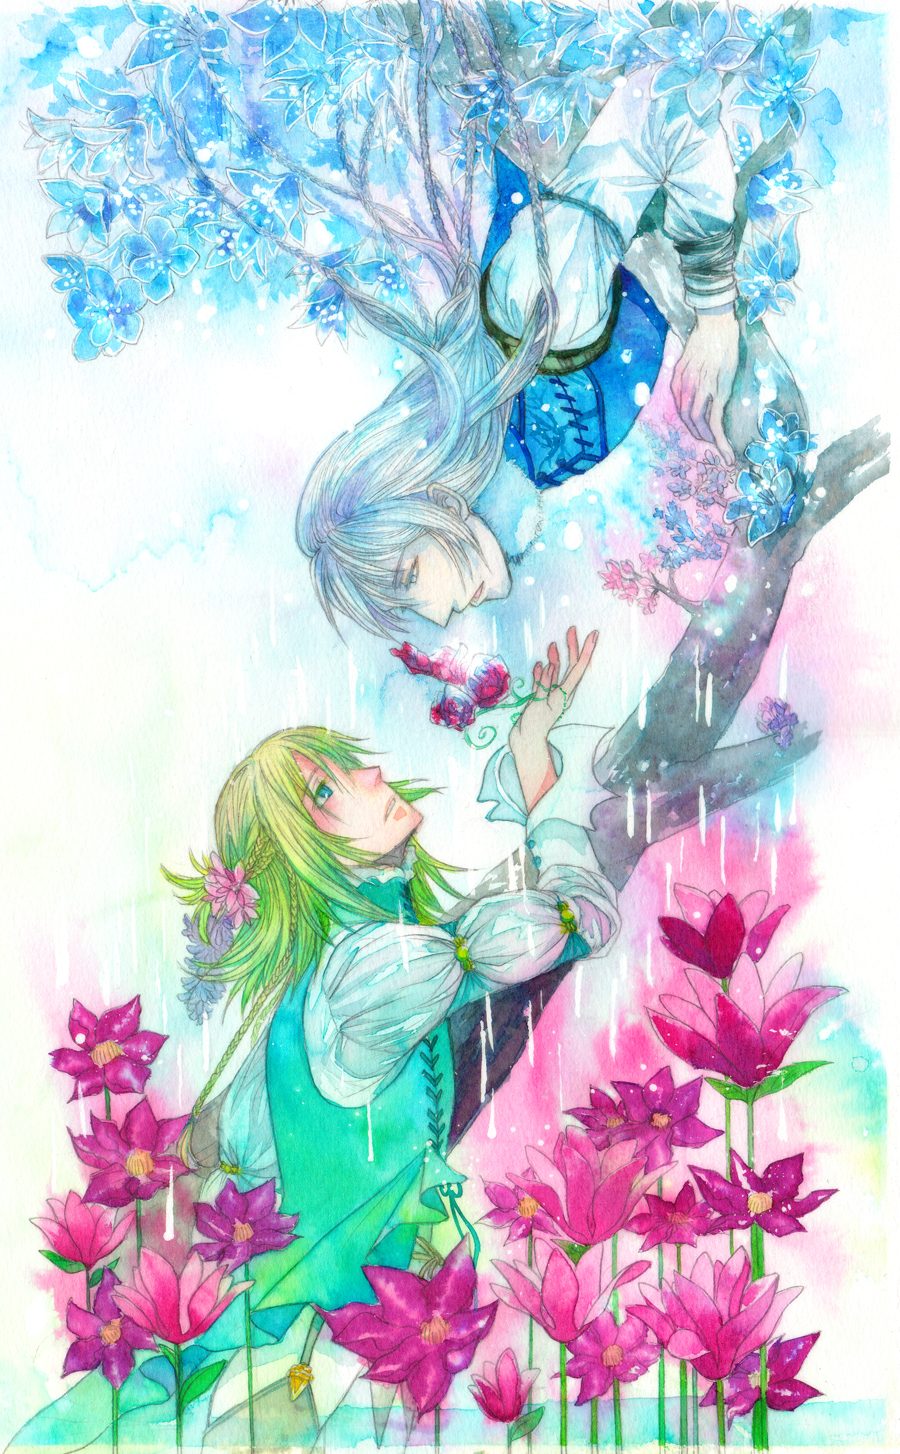 SV : When the snow melts into rain by Nacrym